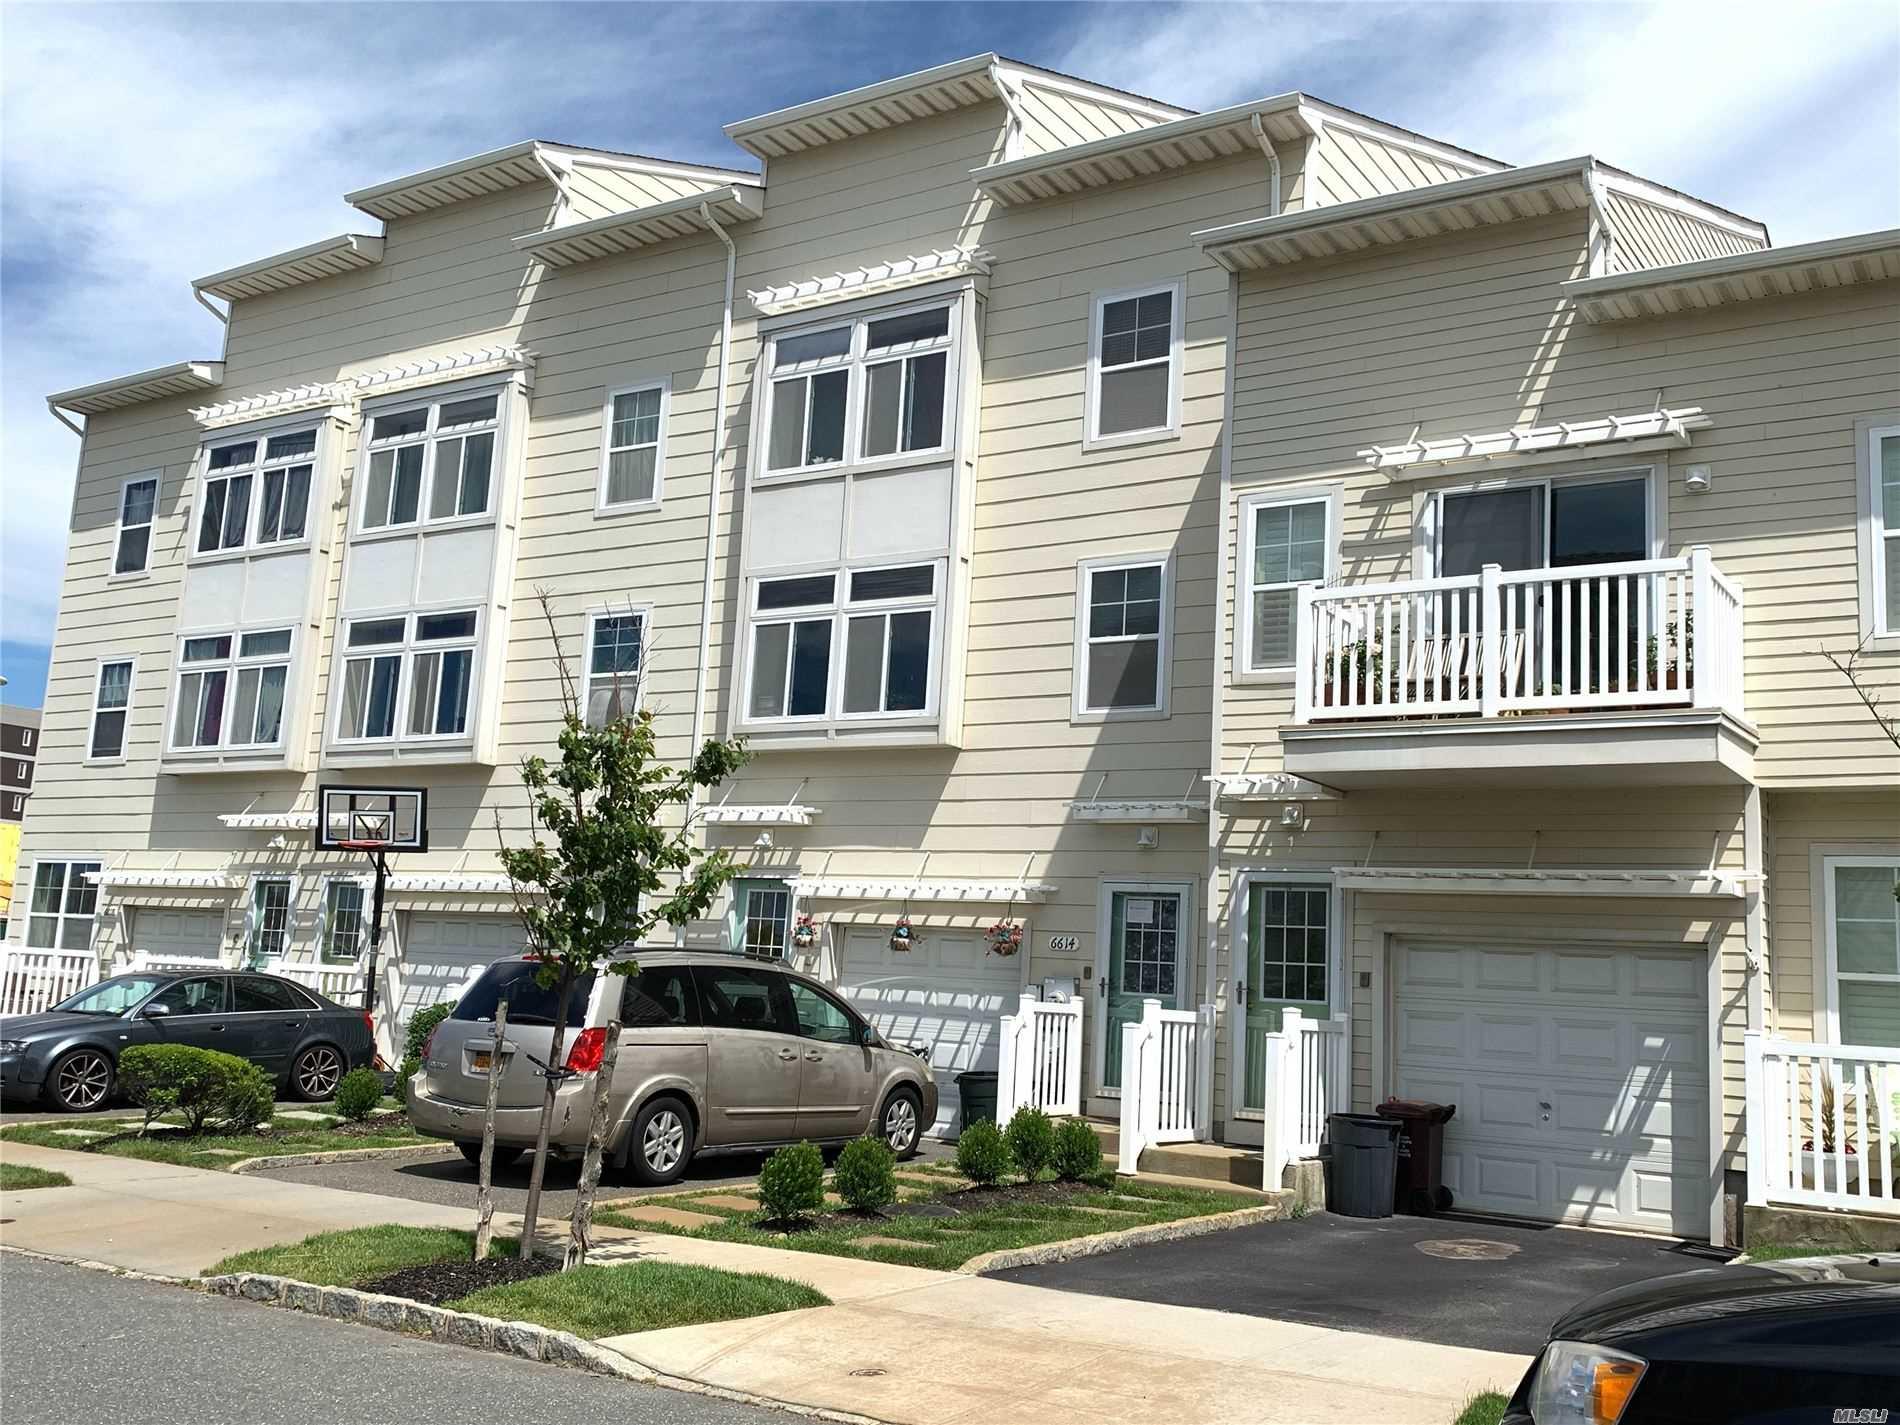 Property for sale at 6614 Seaspray Avenue, Arverne NY 11692, Arverne,  New York 11692